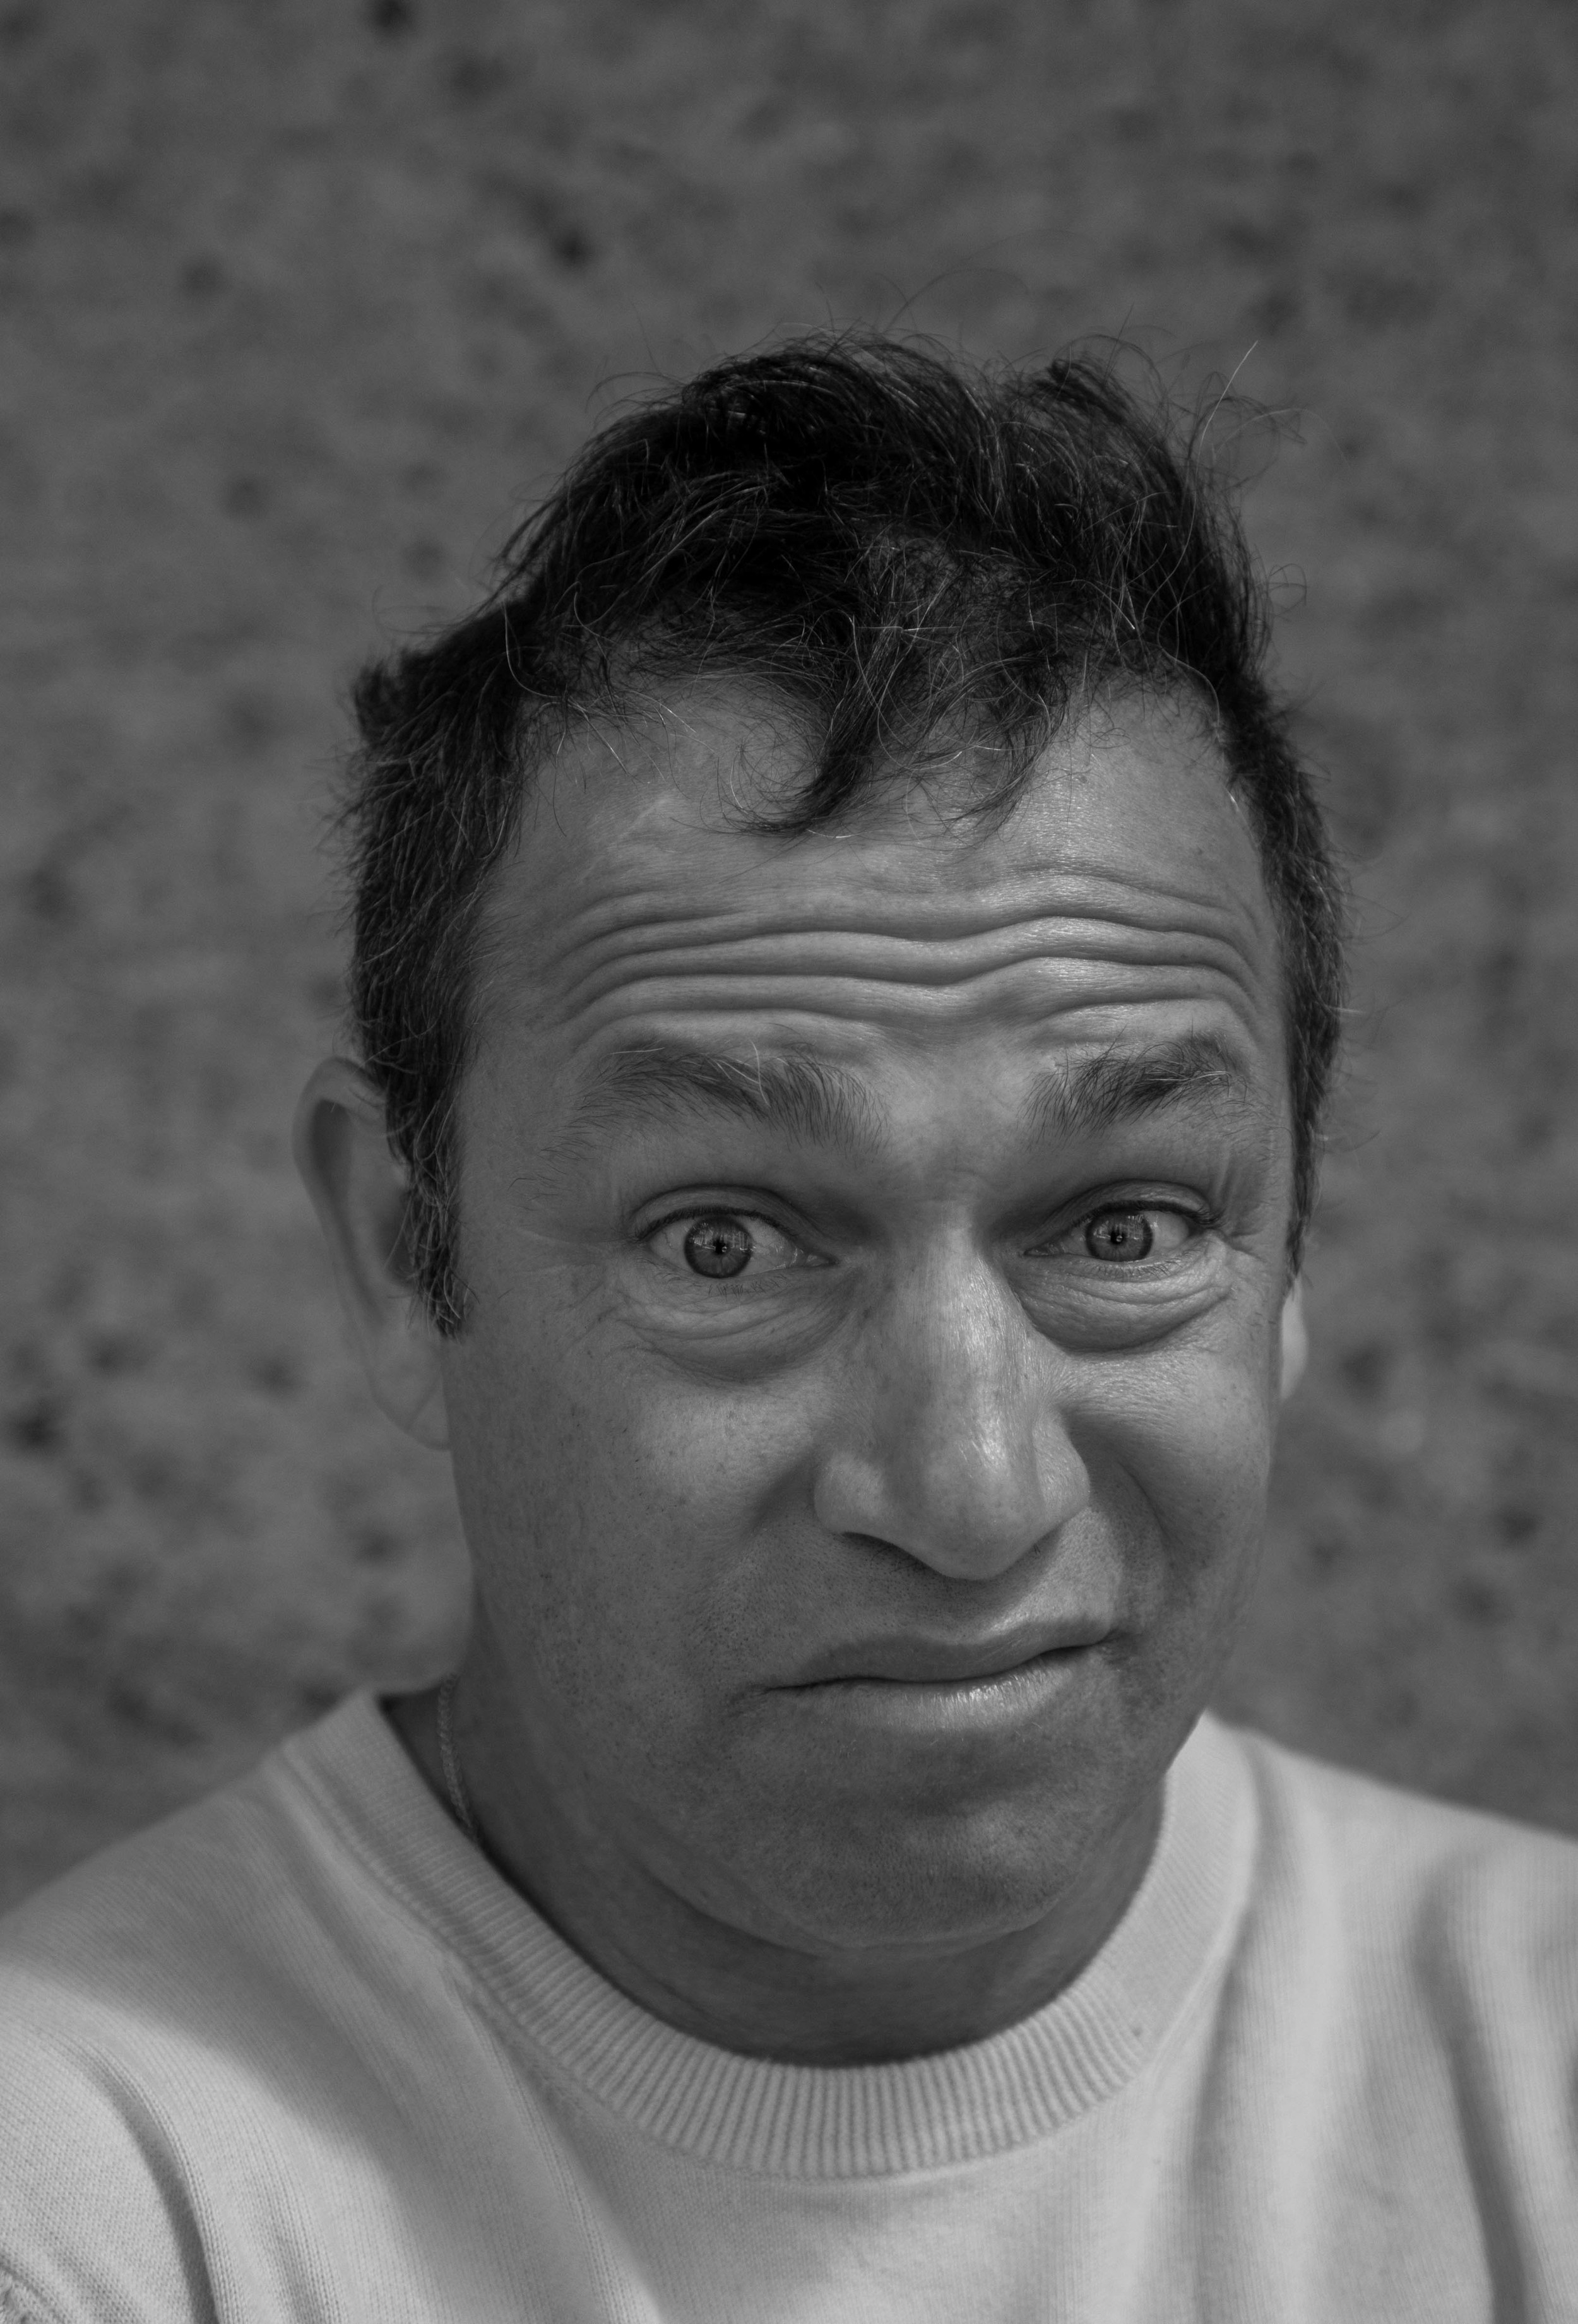 Professional skateboarder and artist Mark Gonzales, for Highsnobiety Magazine